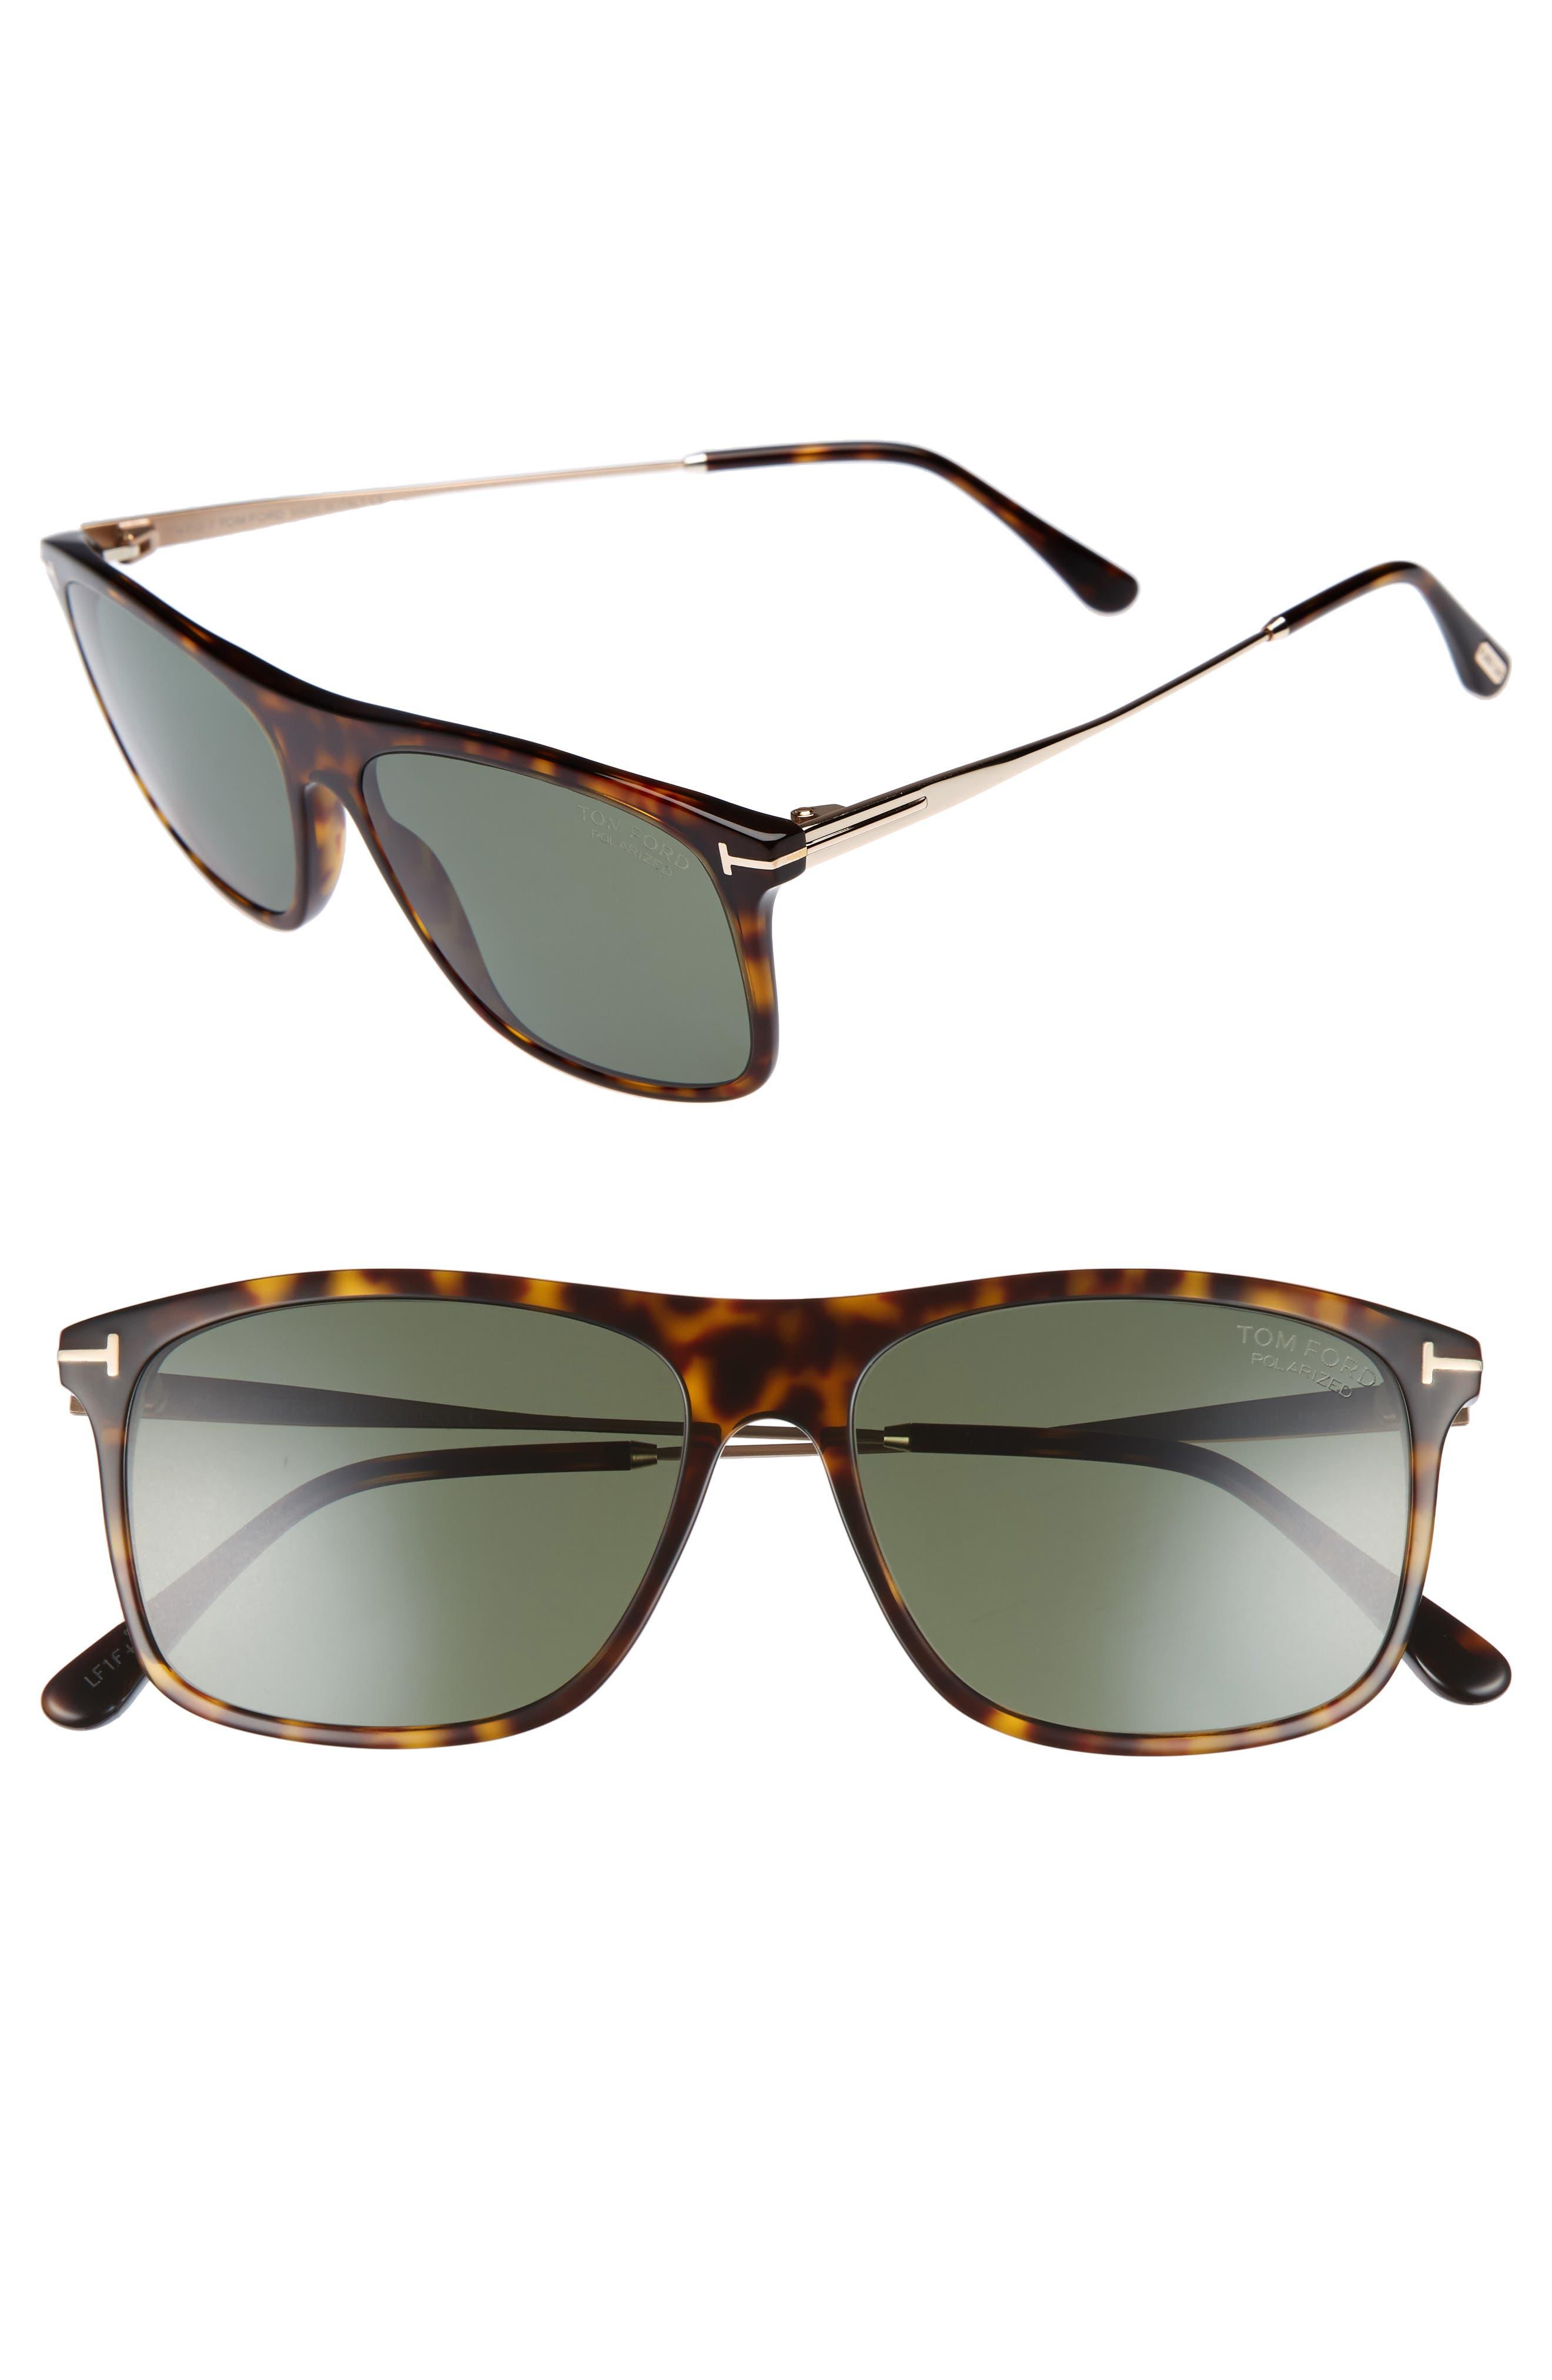 Main Image - Tom Ford Max 57mm Polarized Sunglasses